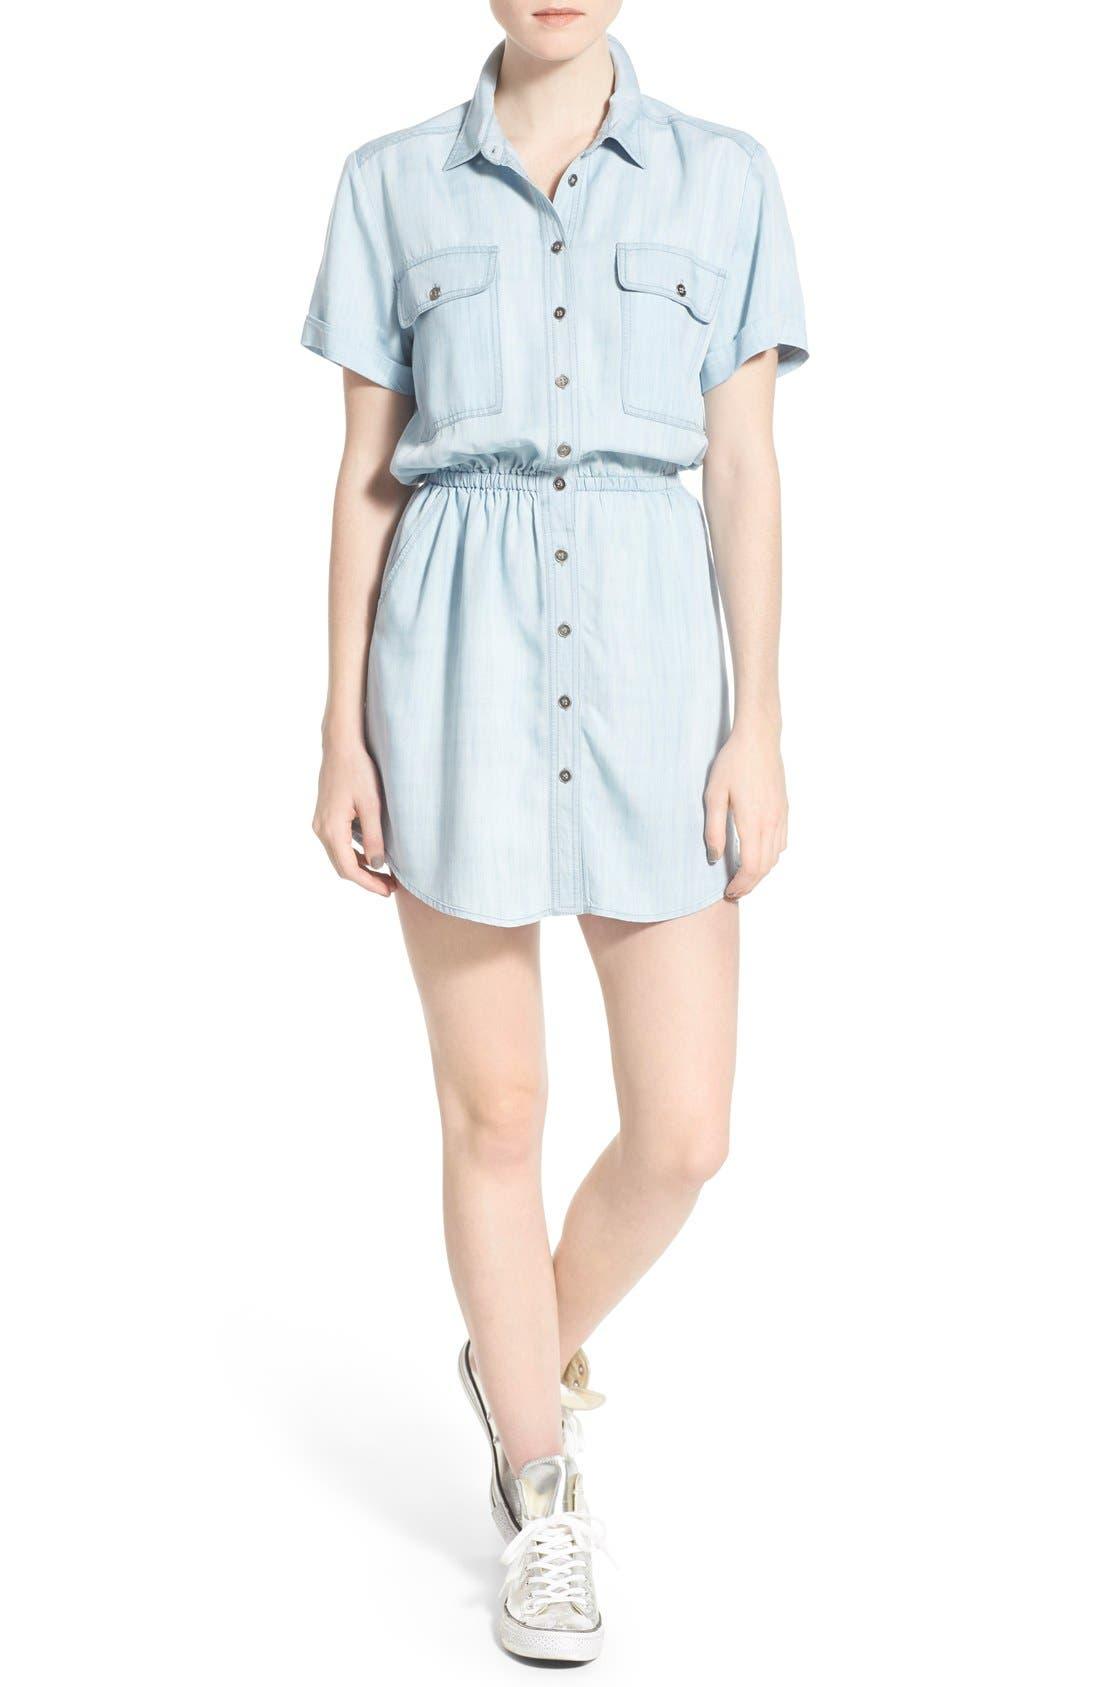 Alternate Image 1 Selected - BP. Chambray Shirtdress